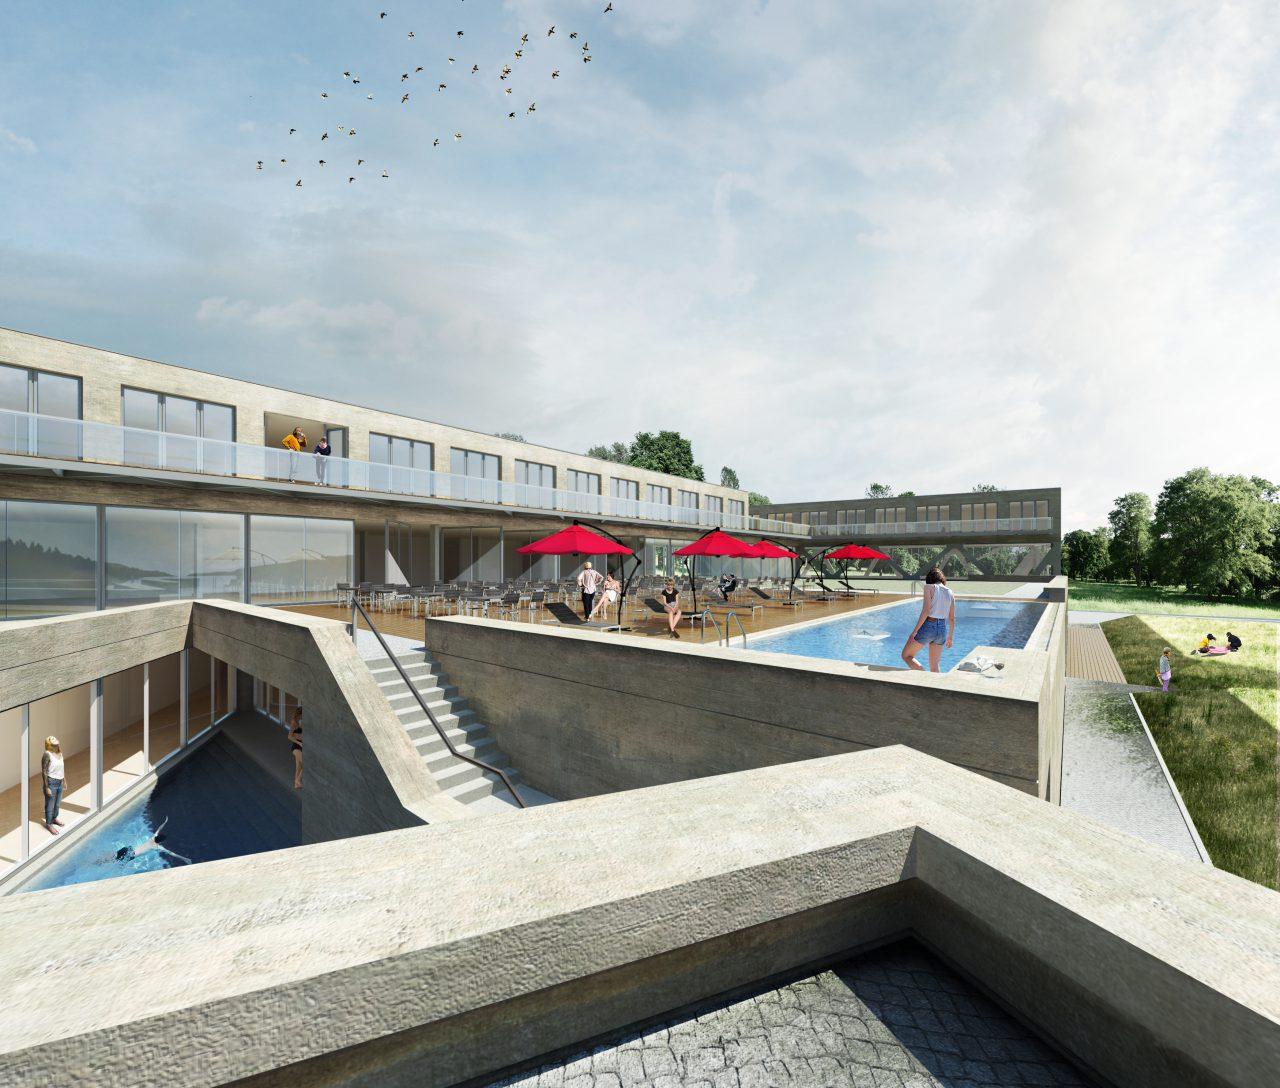 Hotelam See Pool